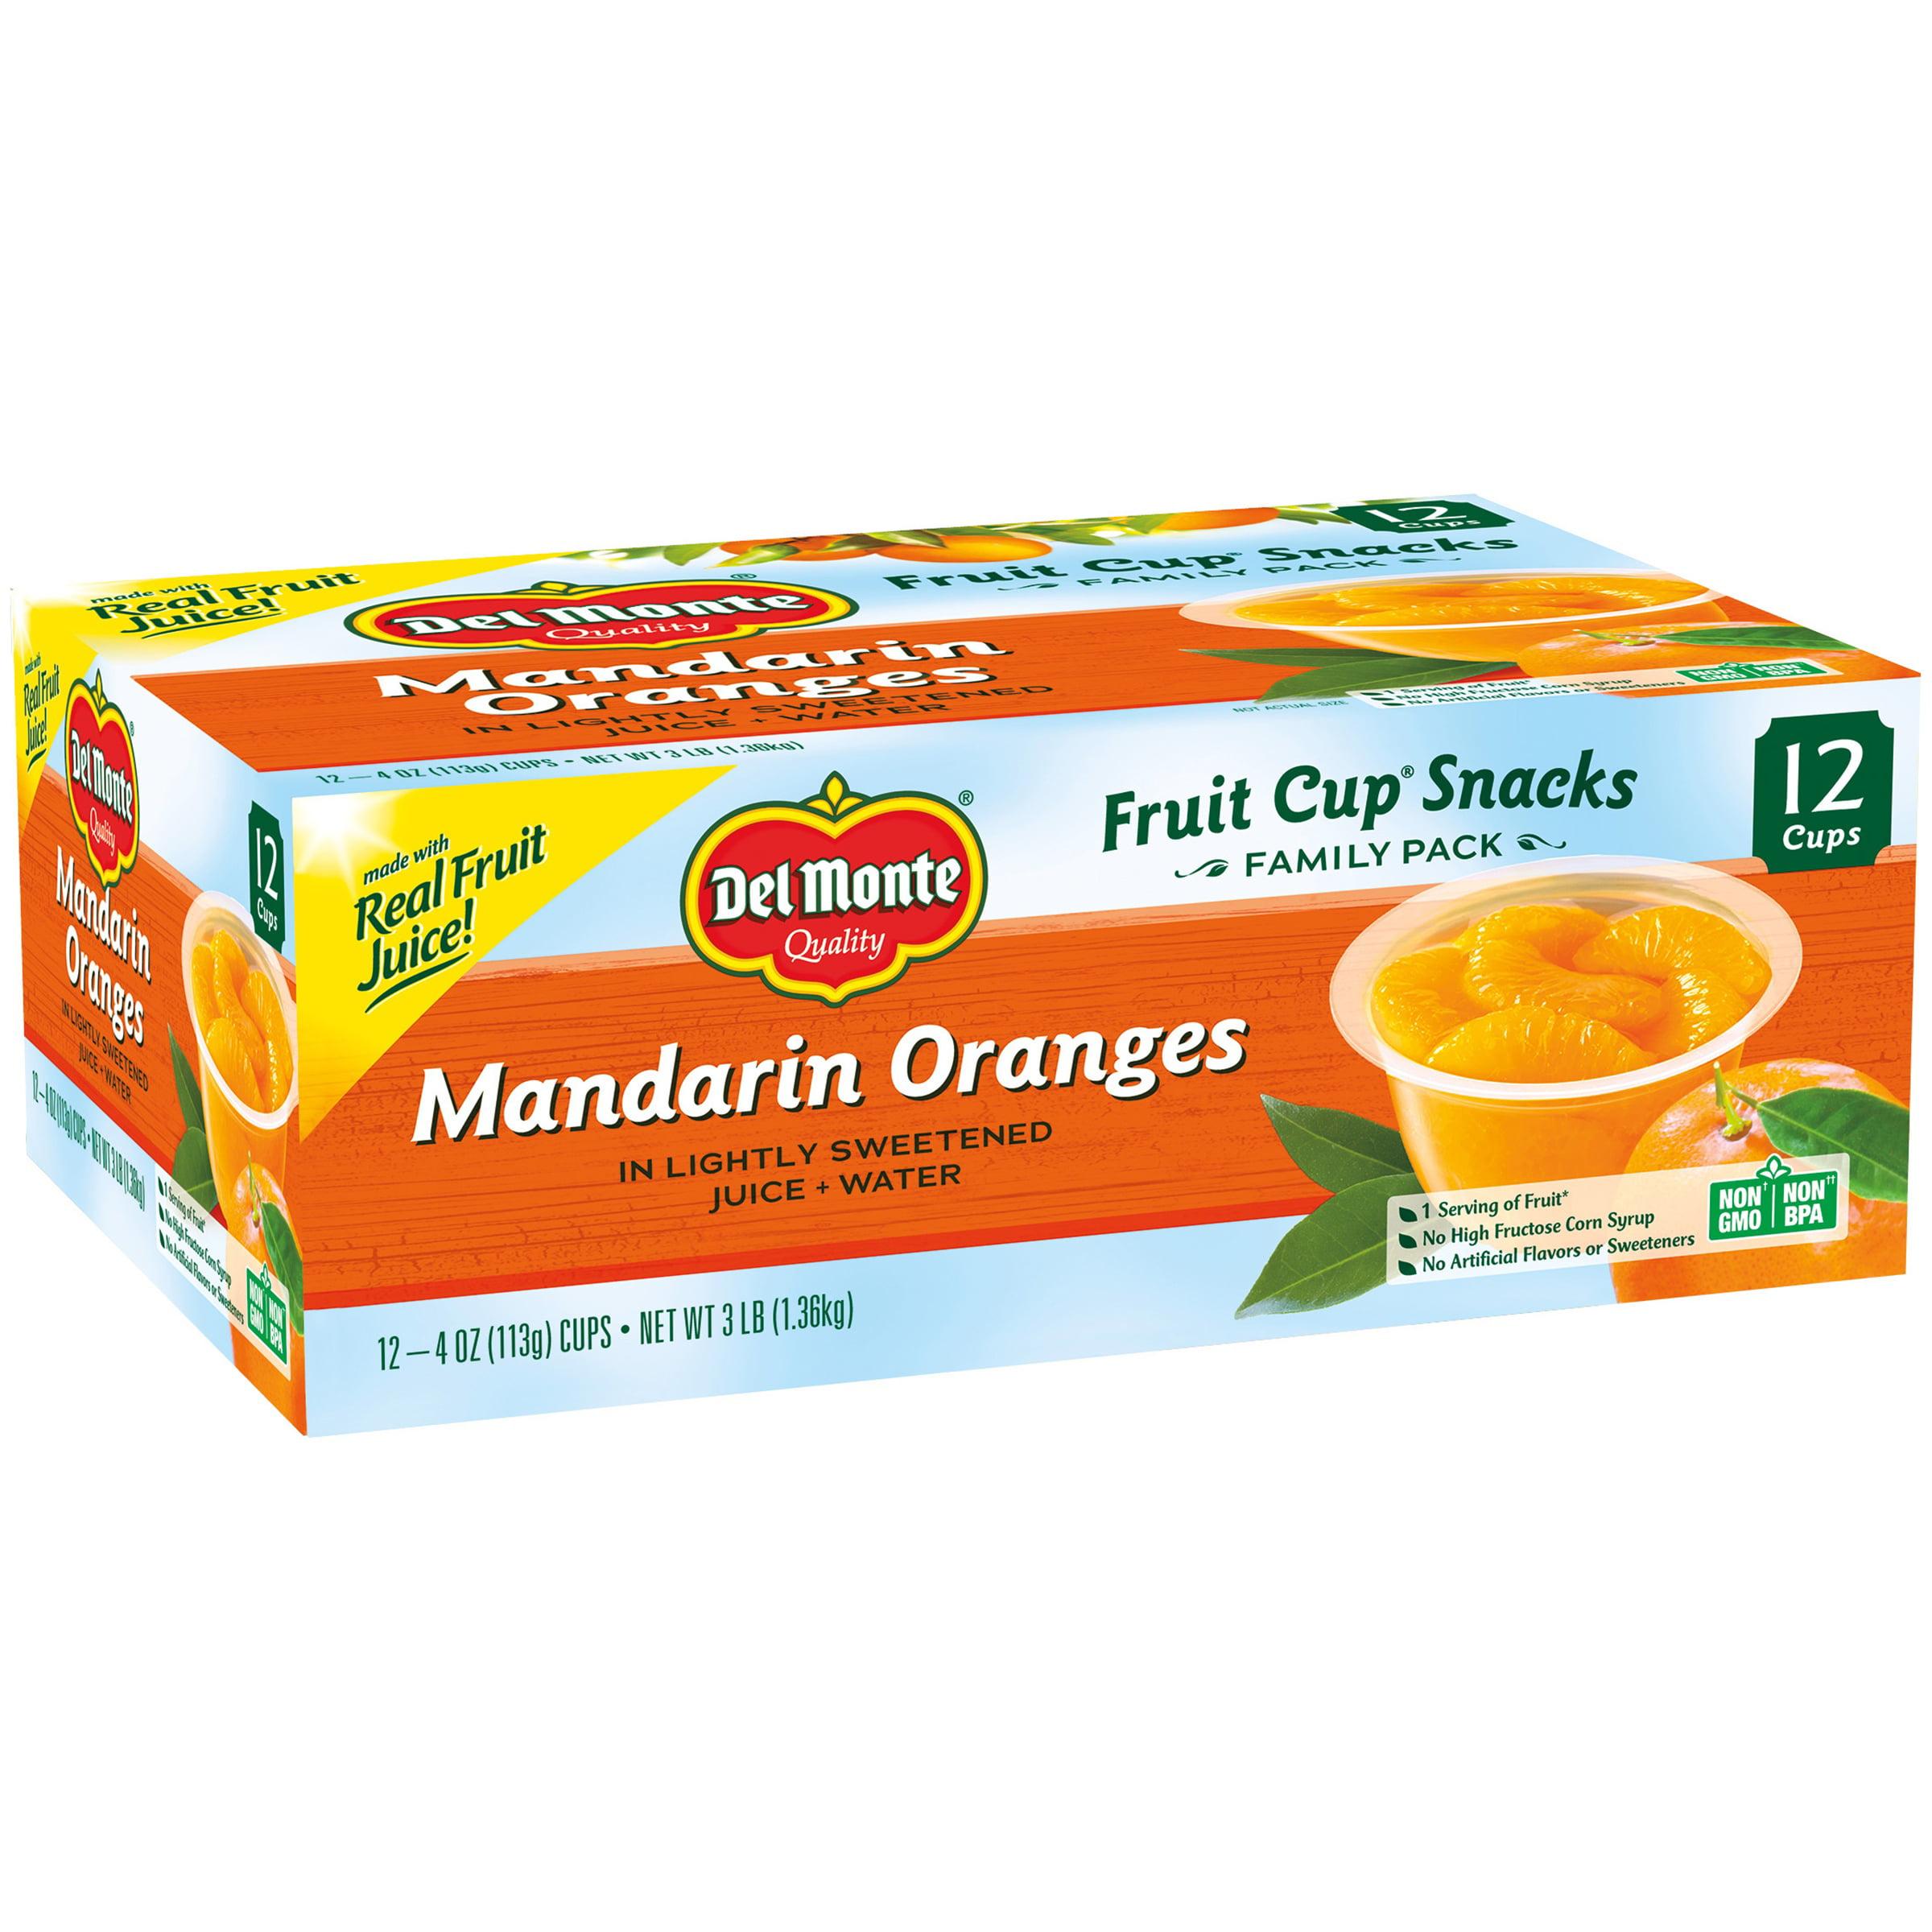 Del Monte Consumer Products Del Monte ® Mandarin Oranges Fruit Cup ® Snacks 12 - 4 oz. Cups